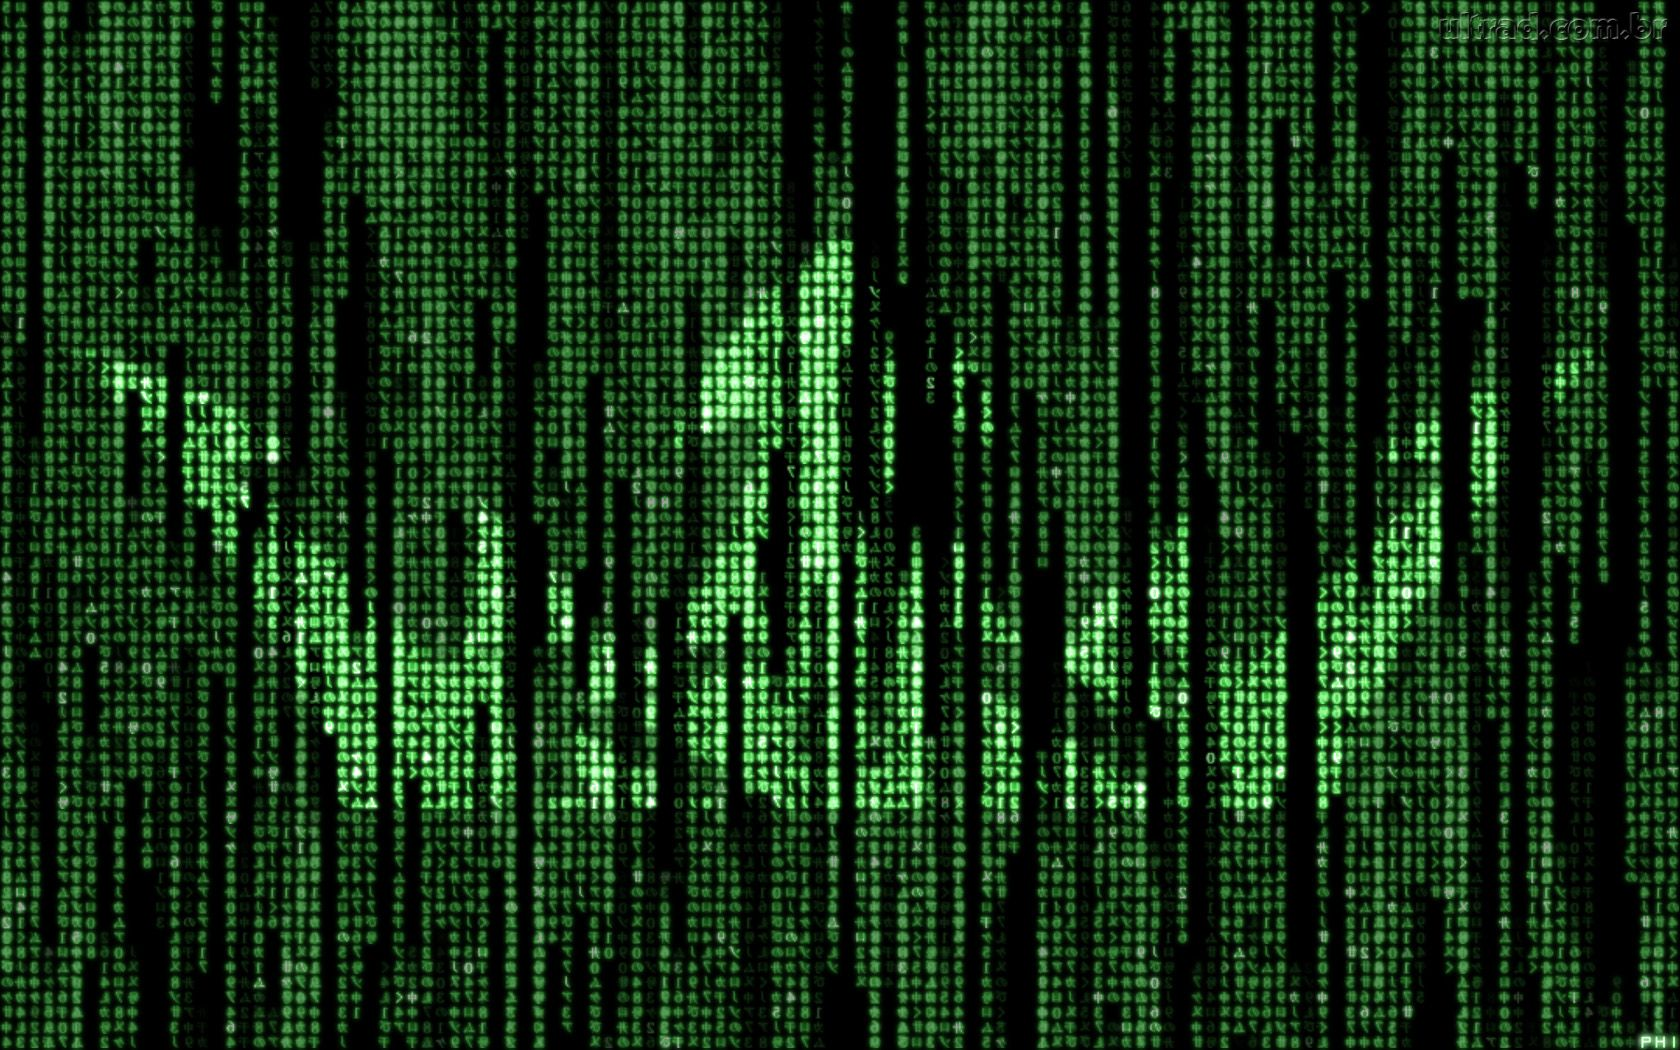 binary wallpaper wallpapersafari - photo #15